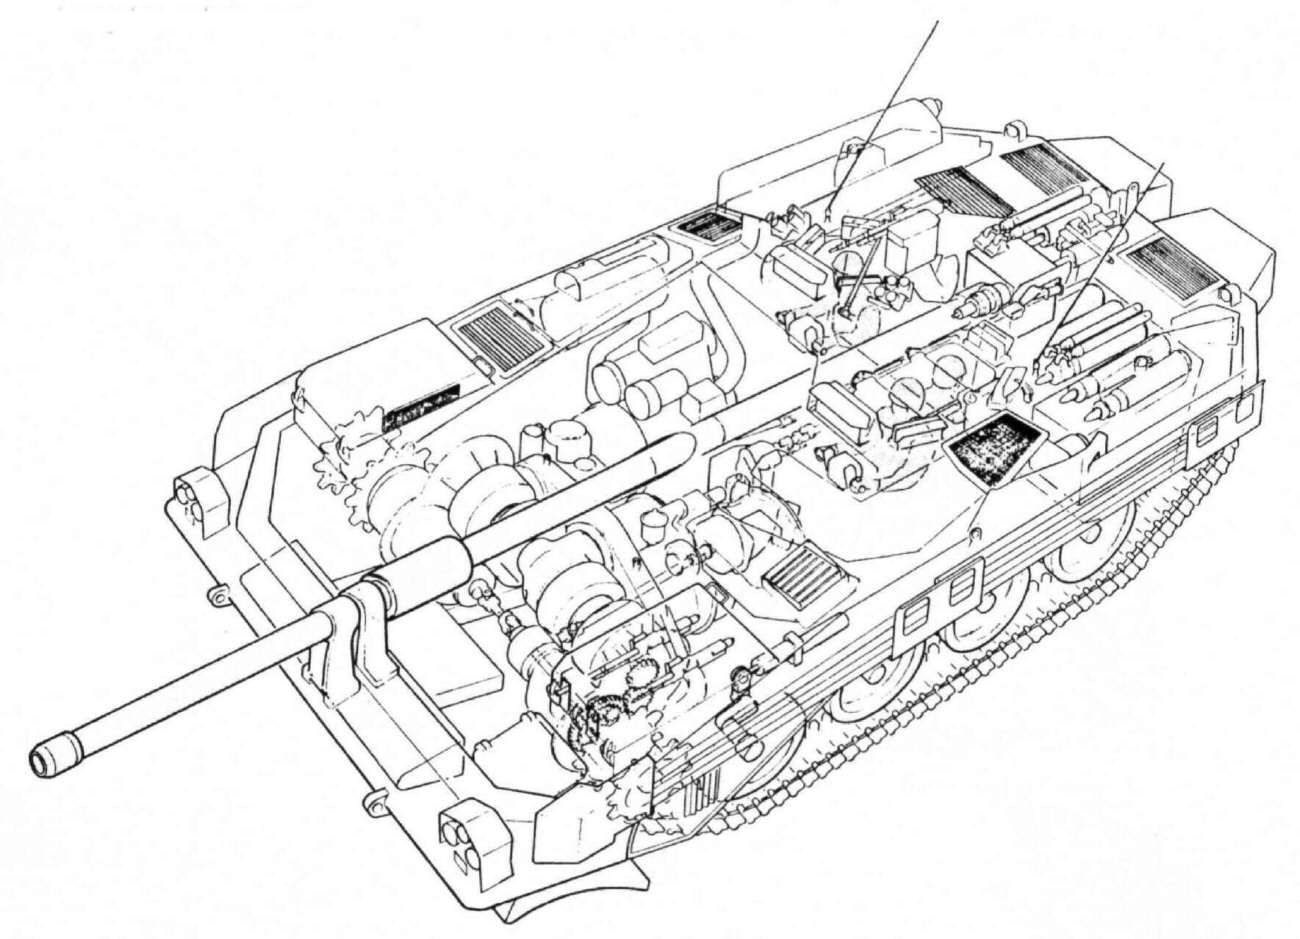 「A Visual History of Armored Vehicles」おしゃれまとめの人気アイデア